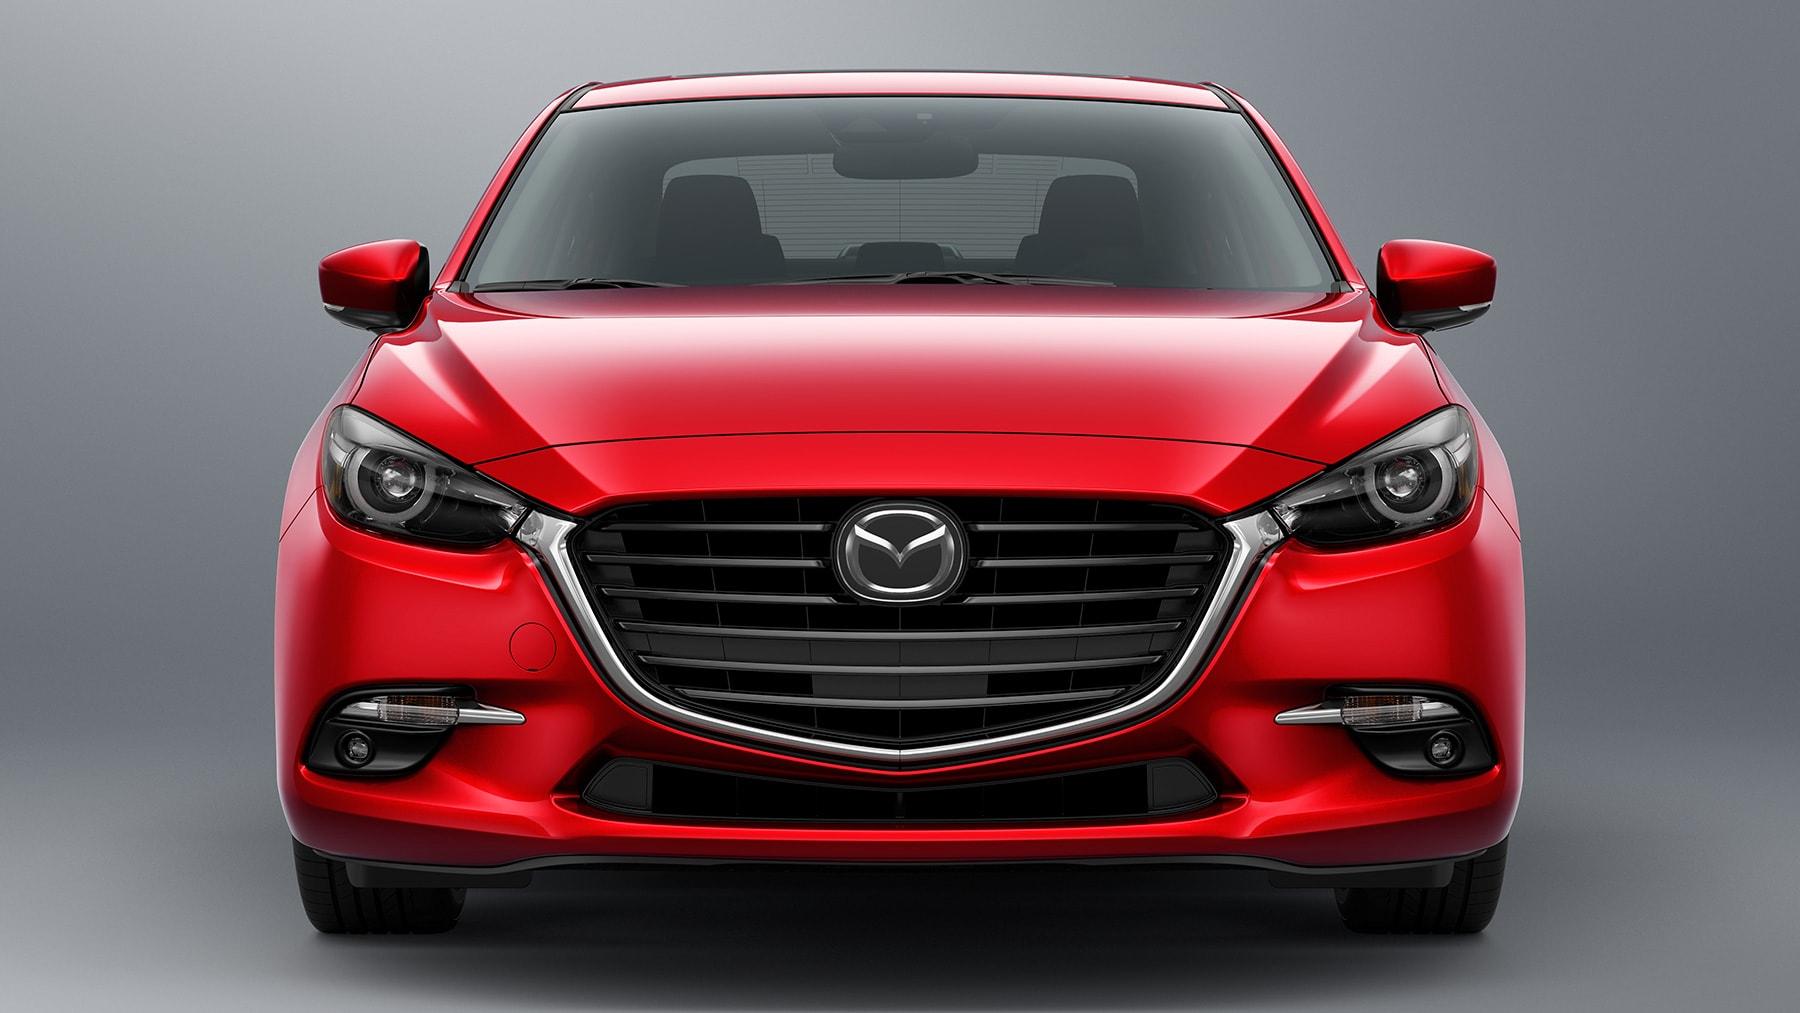 Mazda 3 Owners Manual: Engine Coolant